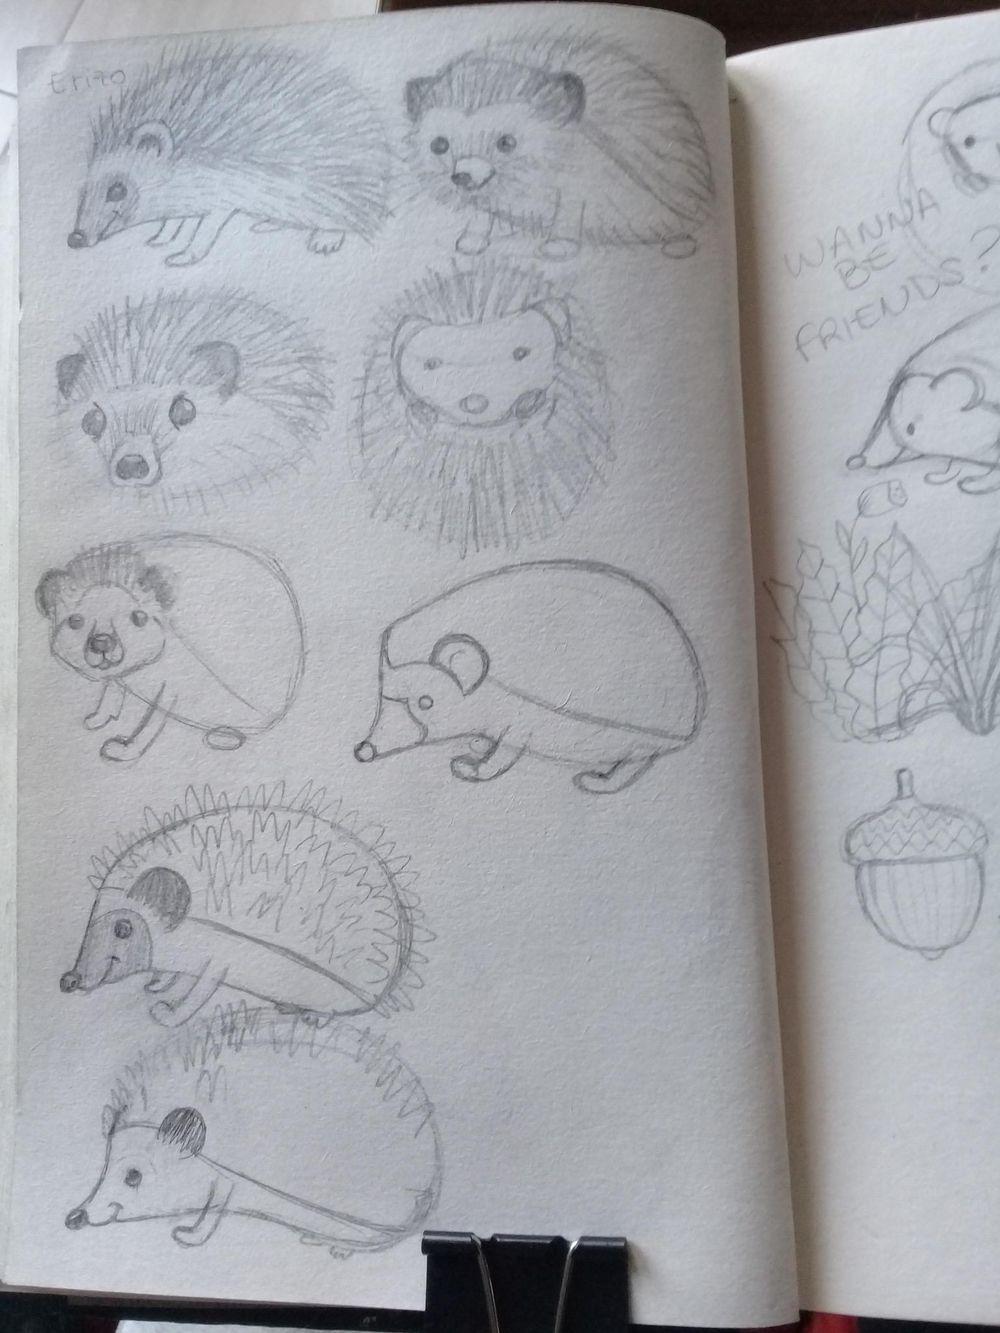 Erizo simpático (Friendly hedgehog) - image 3 - student project